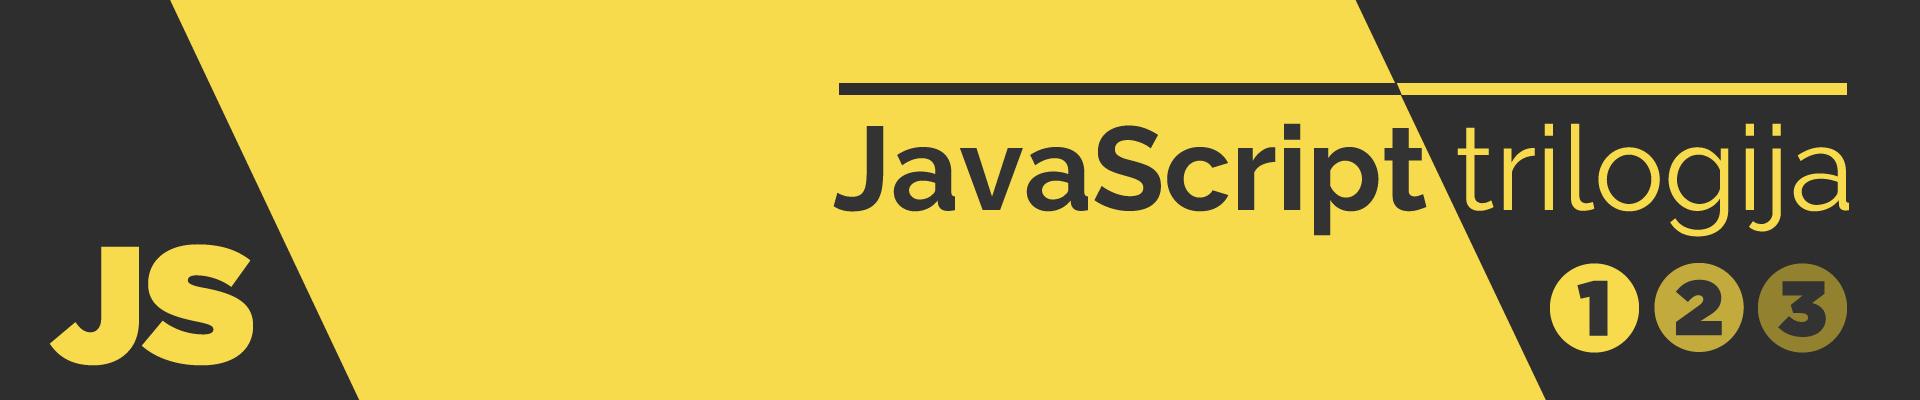 JavaScript Trilogija - Komplet